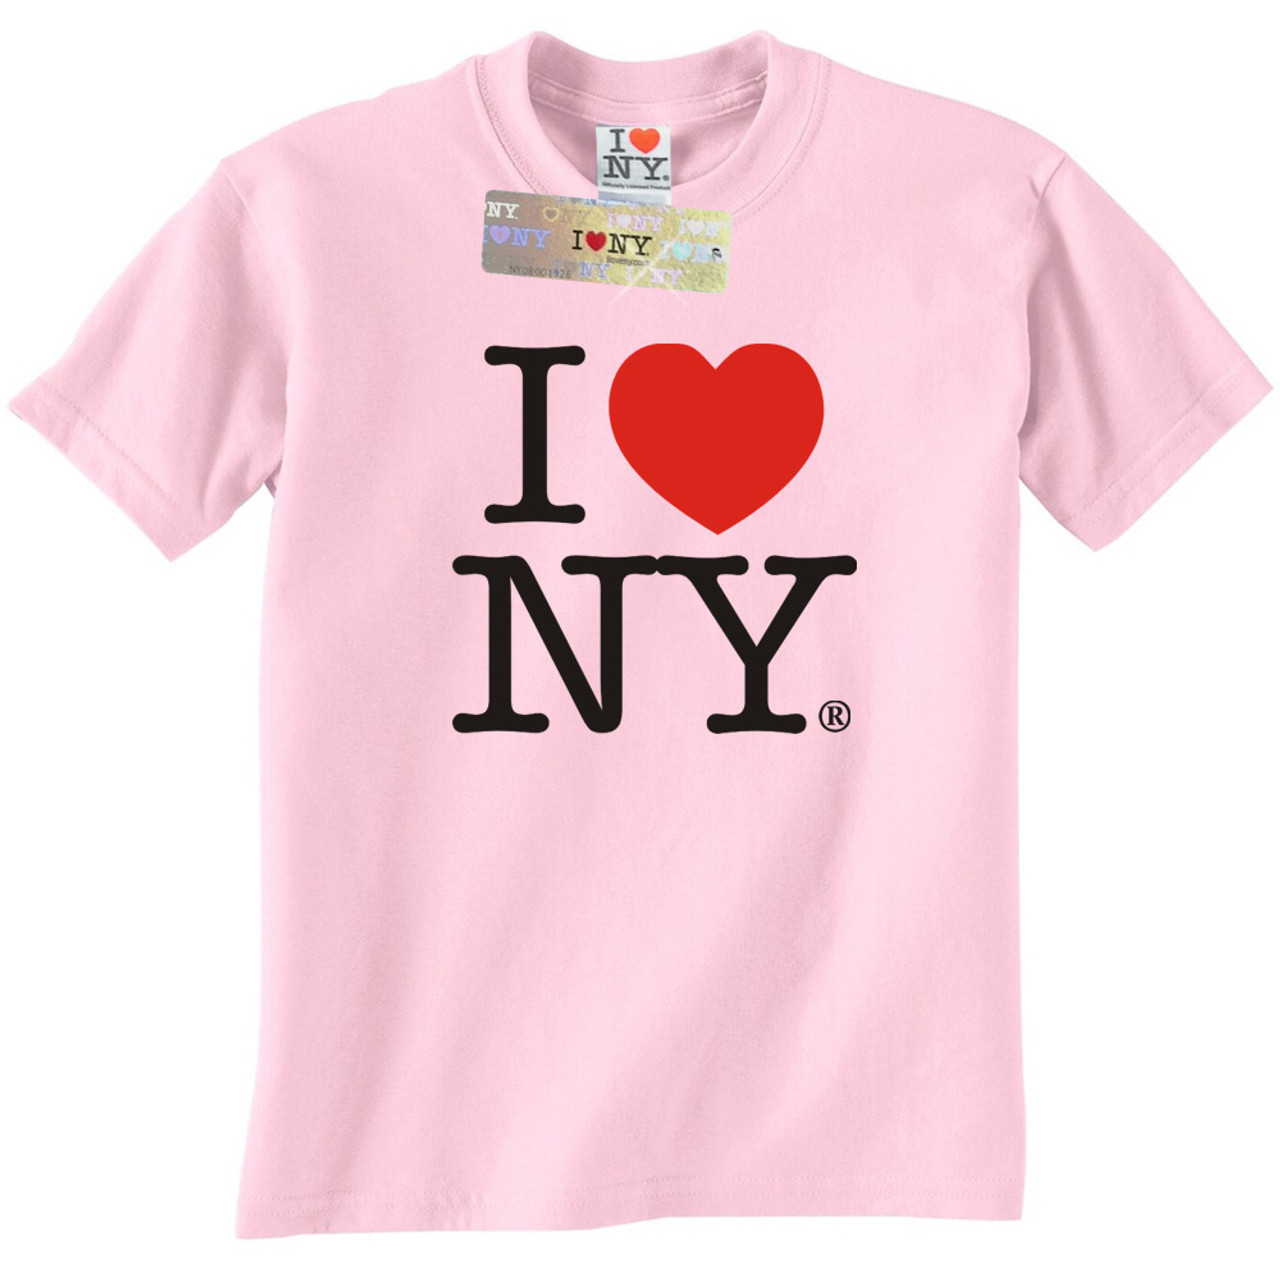 7e79461d Light Pink I Love NY T-Shirt. Brand : Clothing